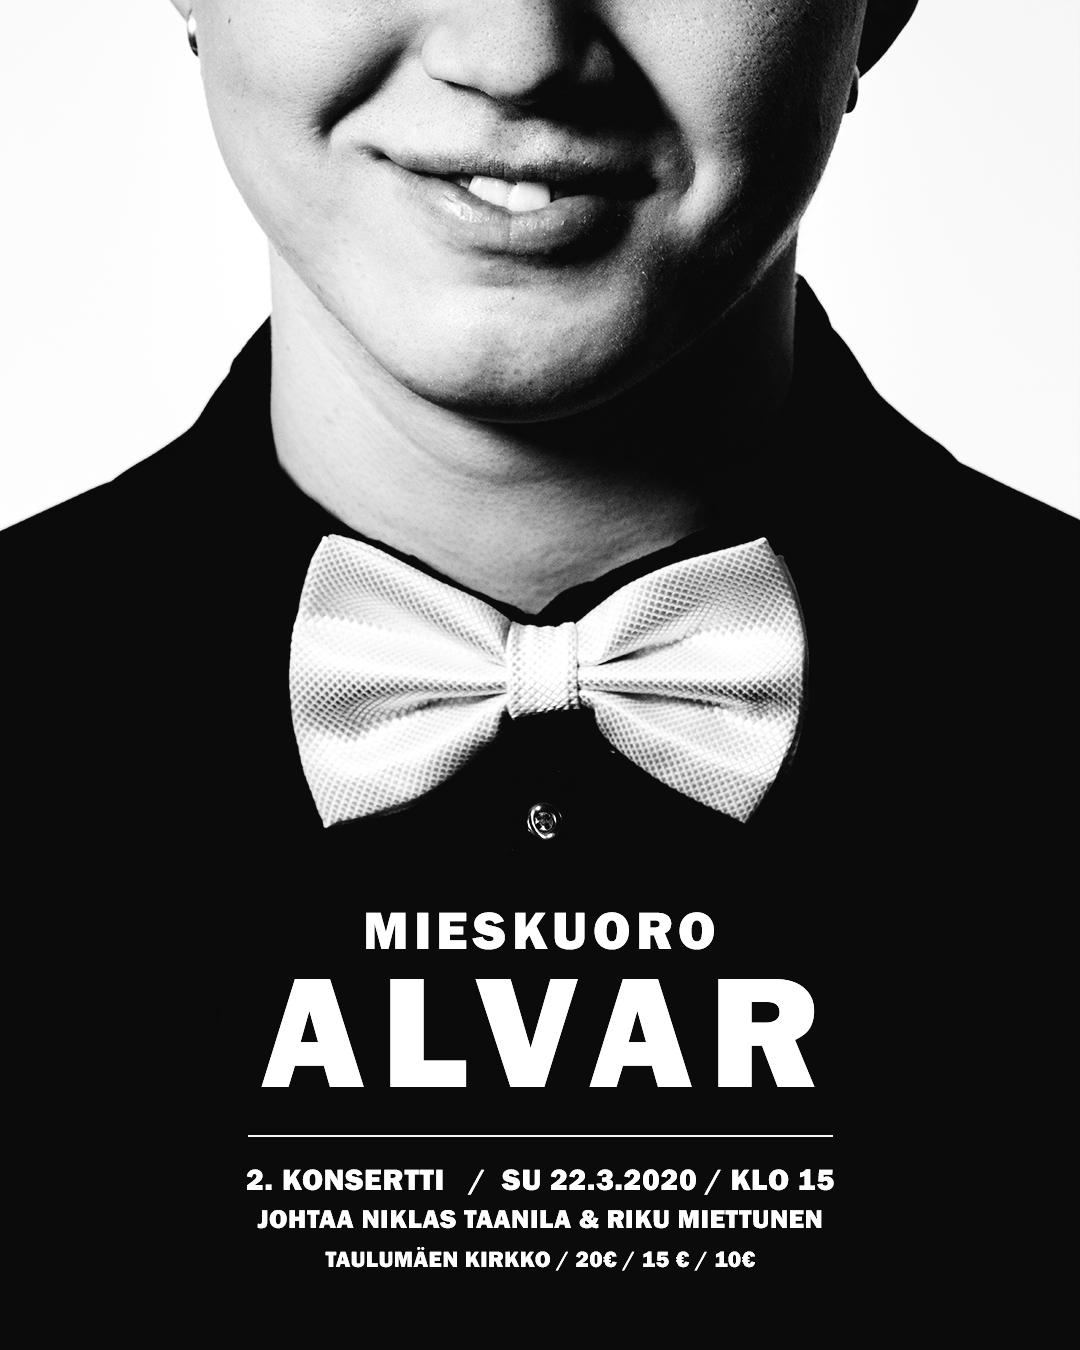 2020 03 08 Mieskuoro Alvari juliste, 2.konsertti, Instagram kuva 1